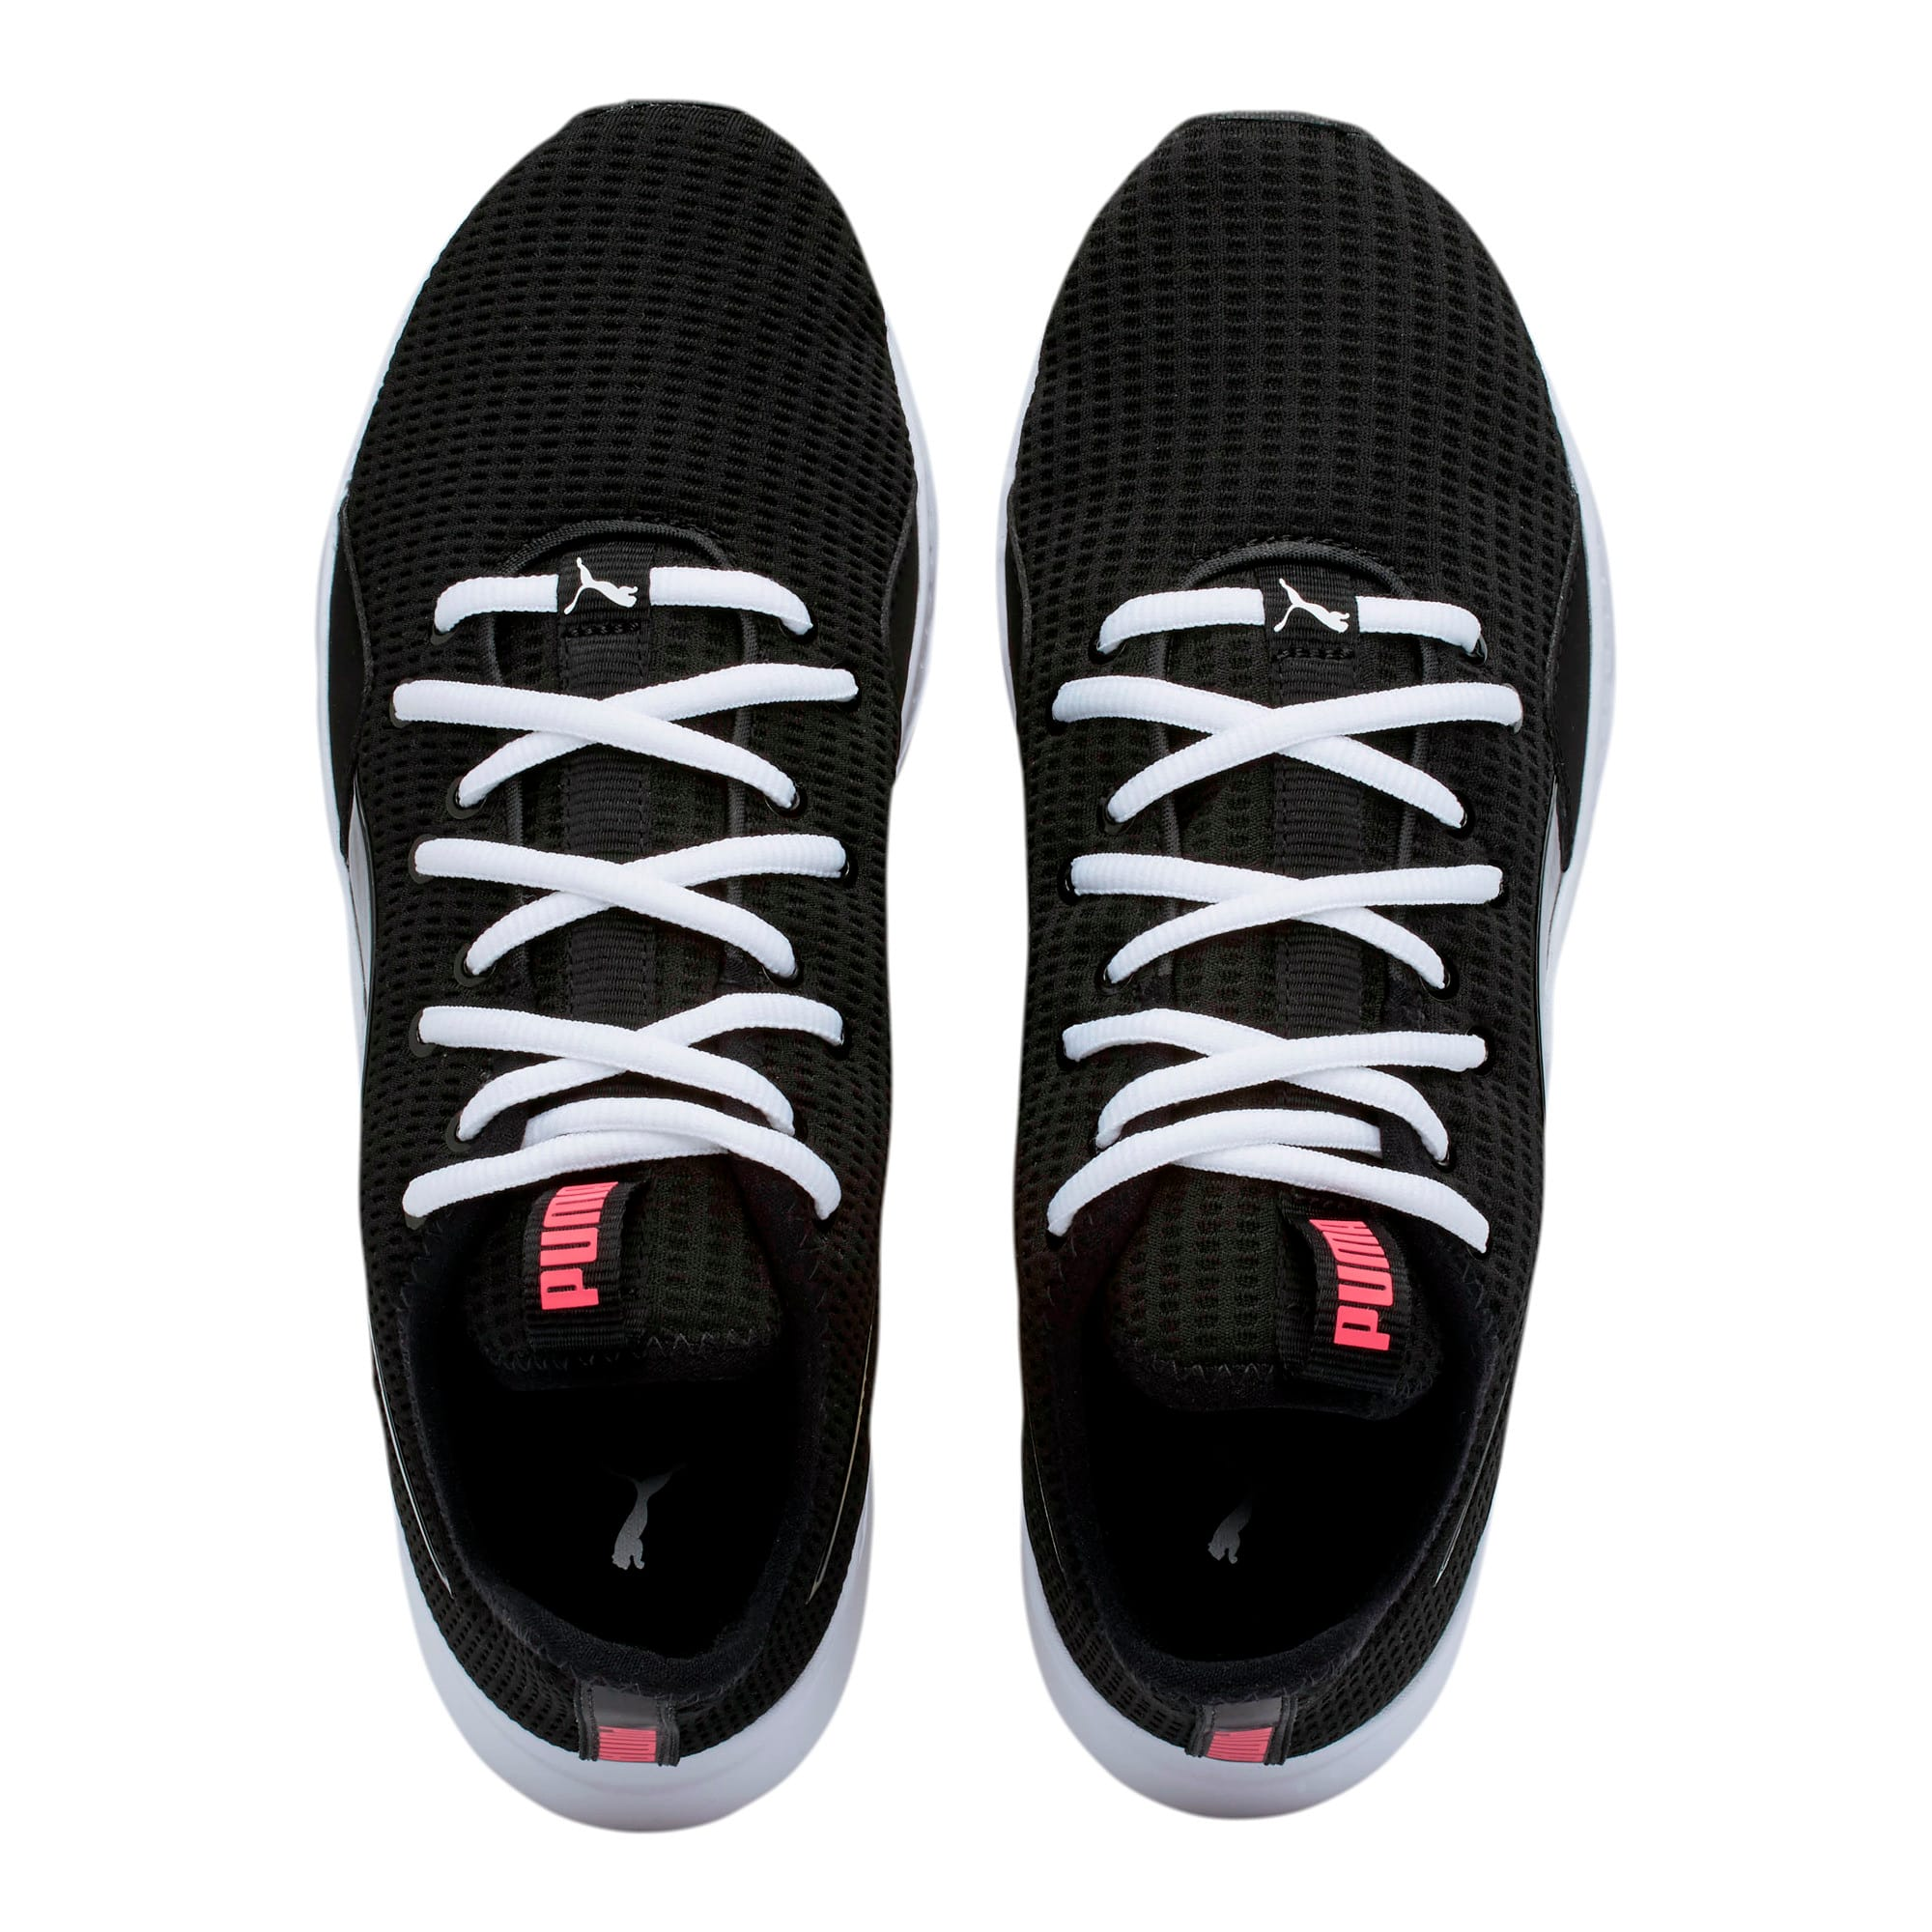 Thumbnail 7 of Incite FS Shift Women's Training Shoes, Puma Black-Nrgy Rose, medium